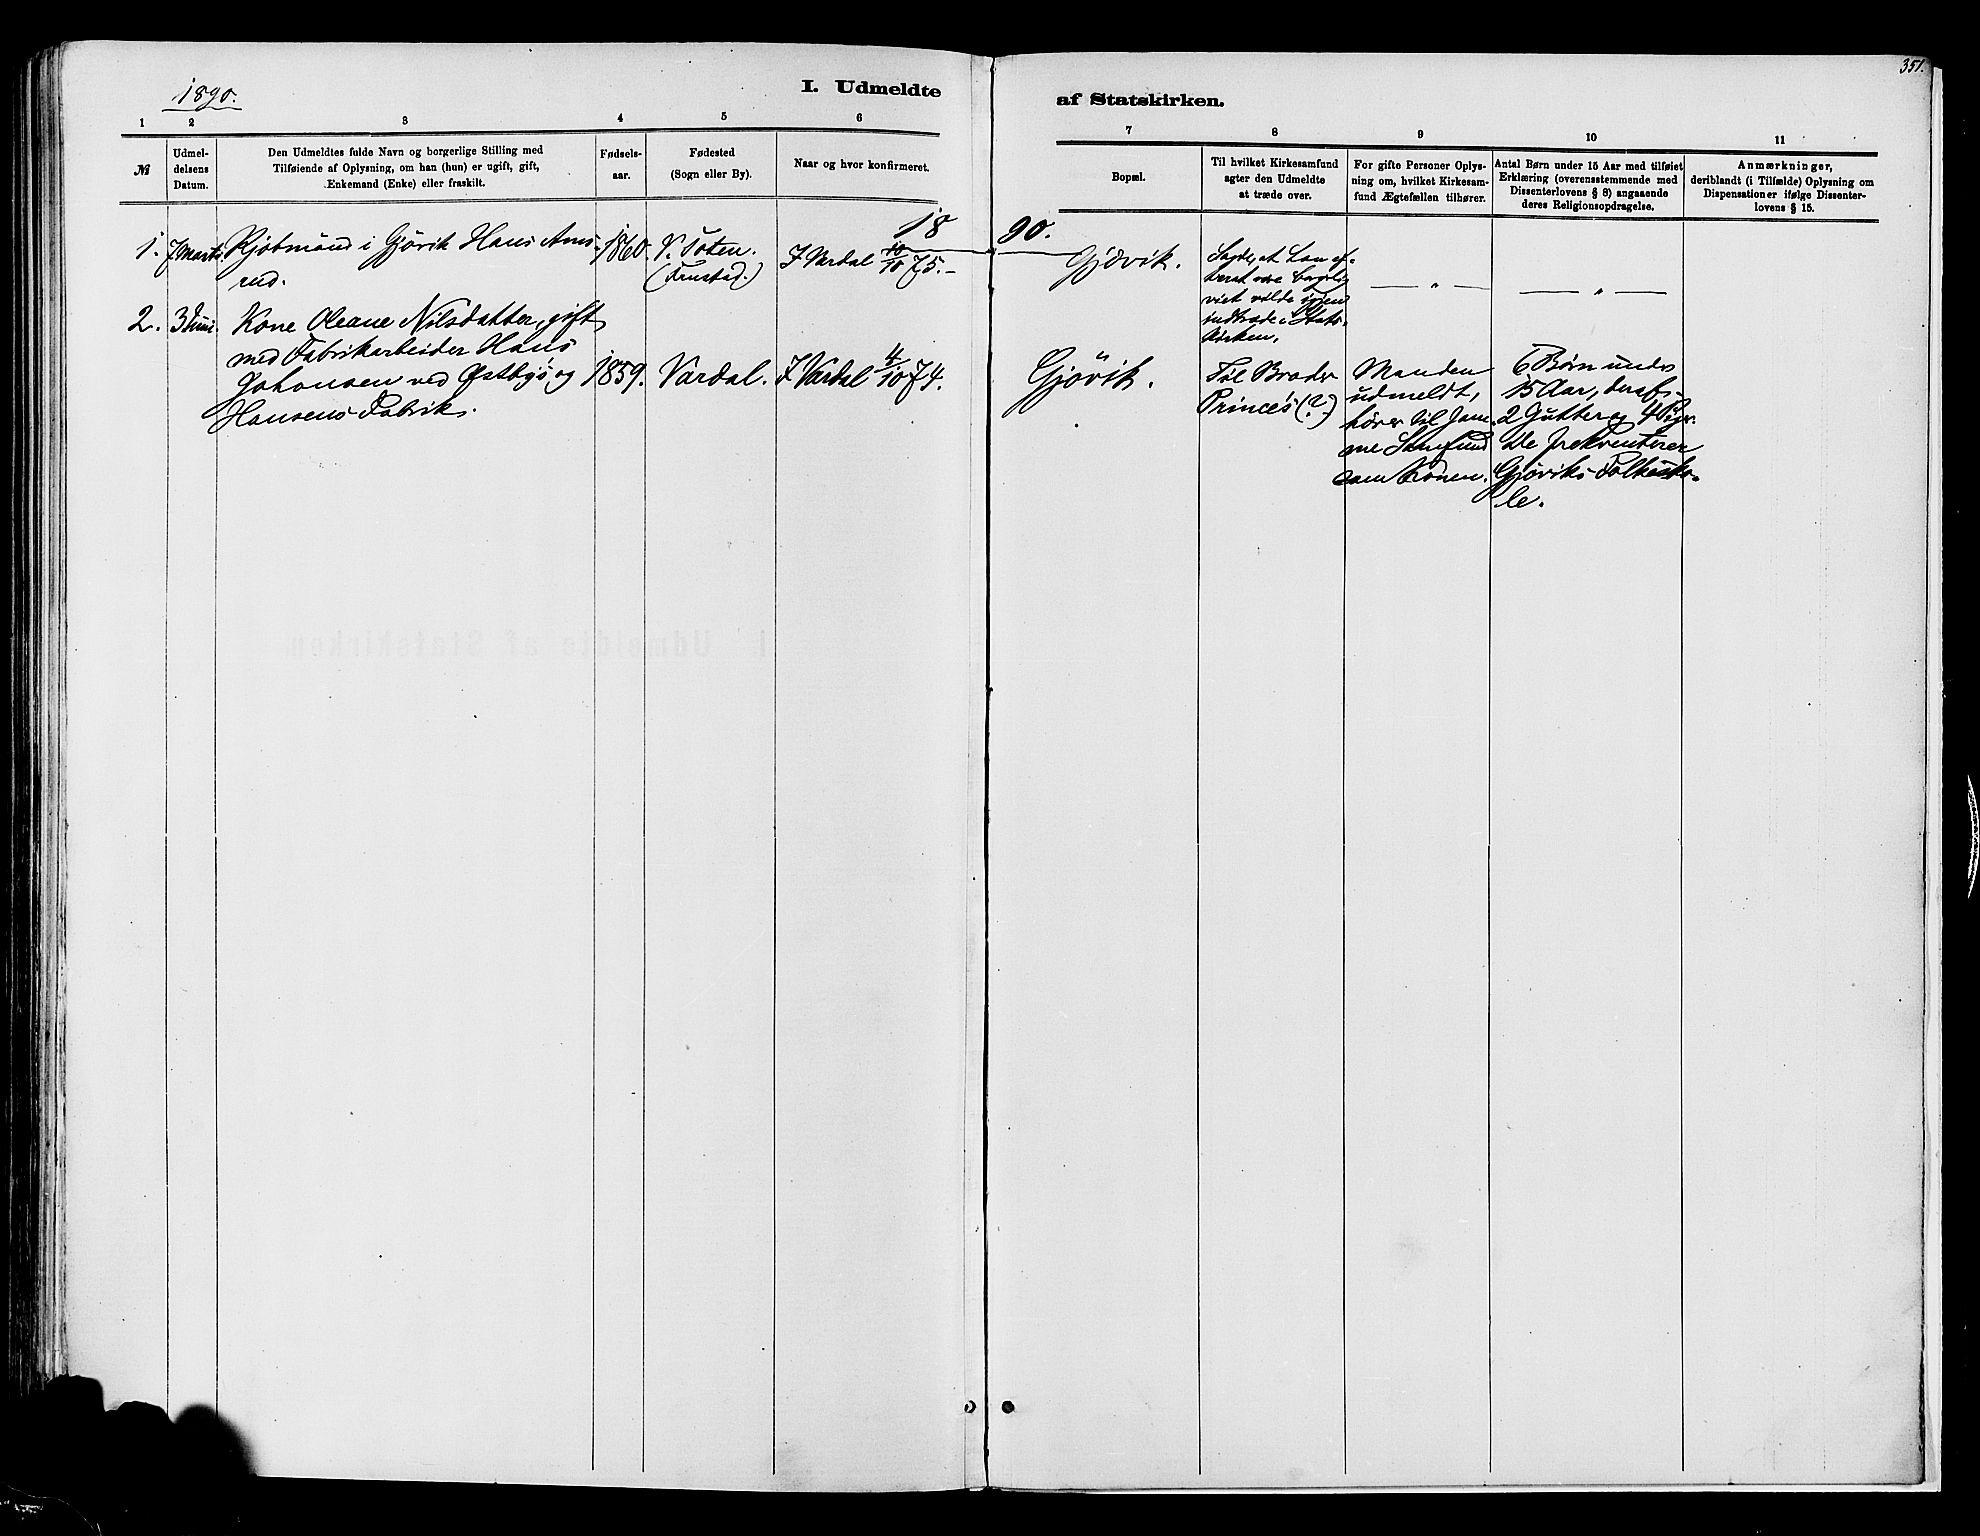 SAH, Vardal prestekontor, H/Ha/Haa/L0008: Ministerialbok nr. 8, 1878-1890, s. 351